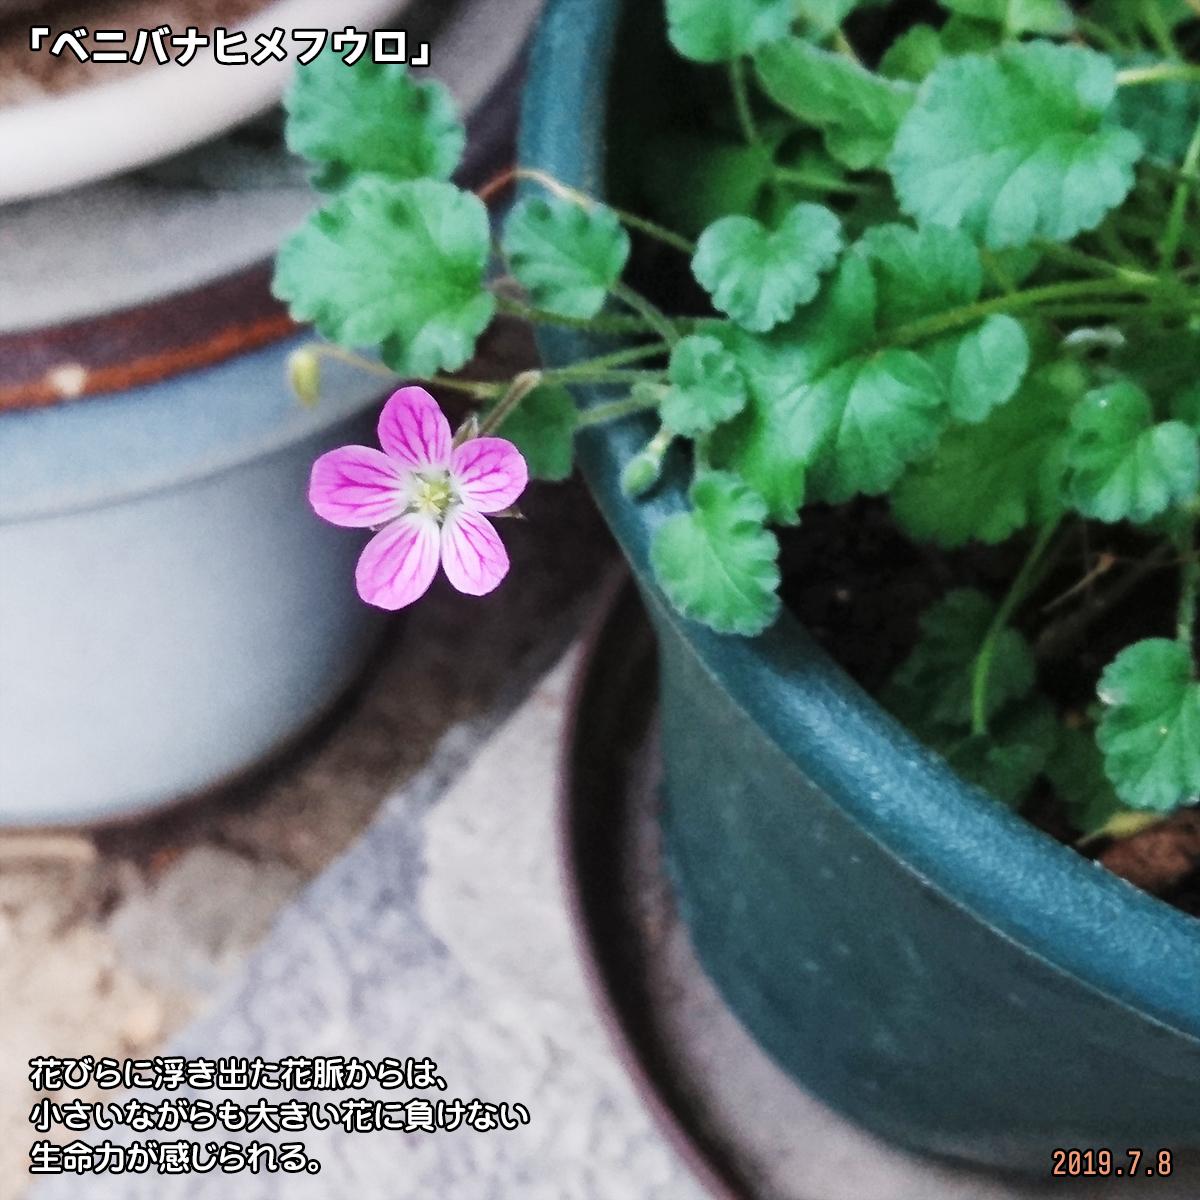 DSC_0939_20190909163647367.jpg